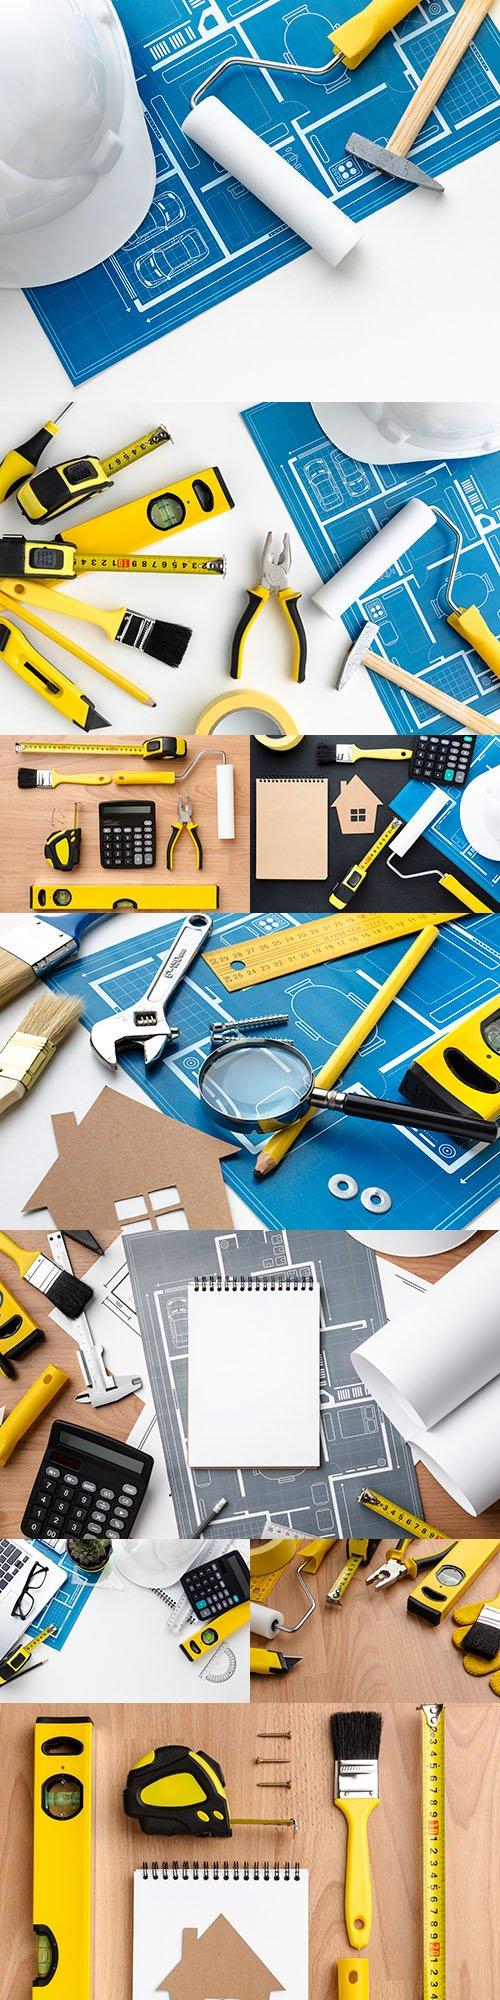 Building tools for repair design composition